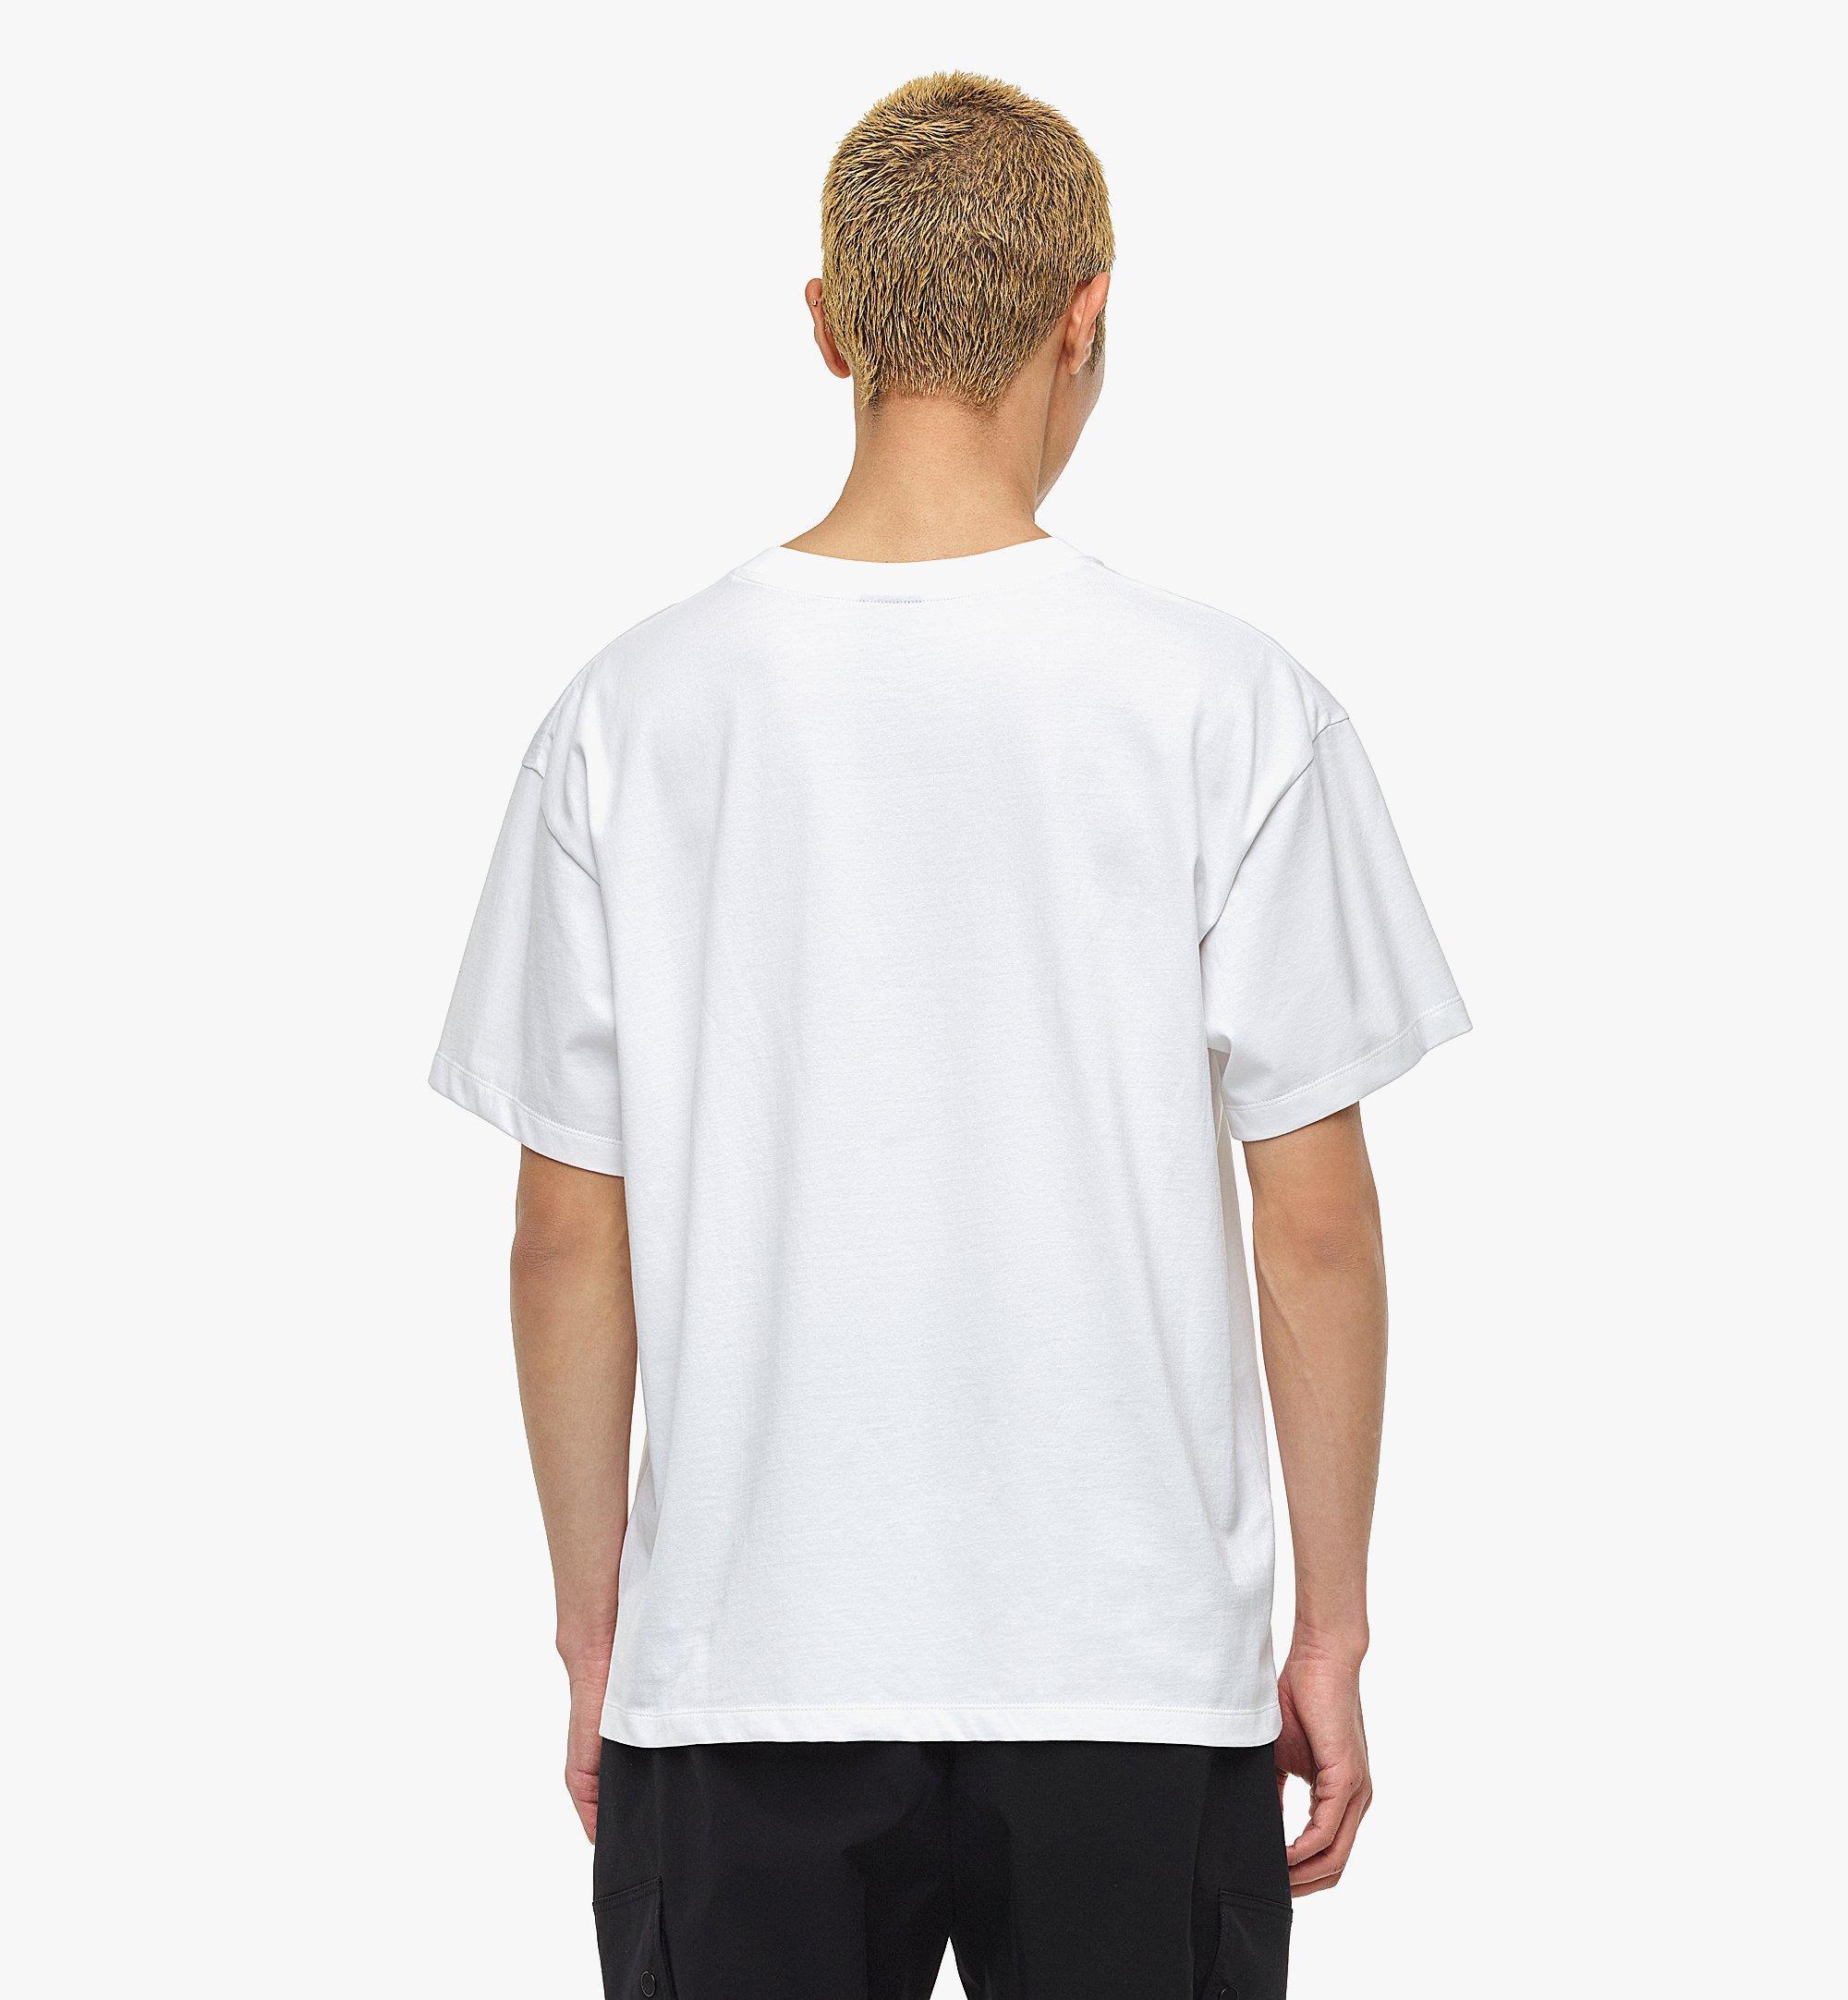 MCM MCM x SAMBYPEN Logo Print T-Shirt White MHTBASP02WD00S Alternate View 4